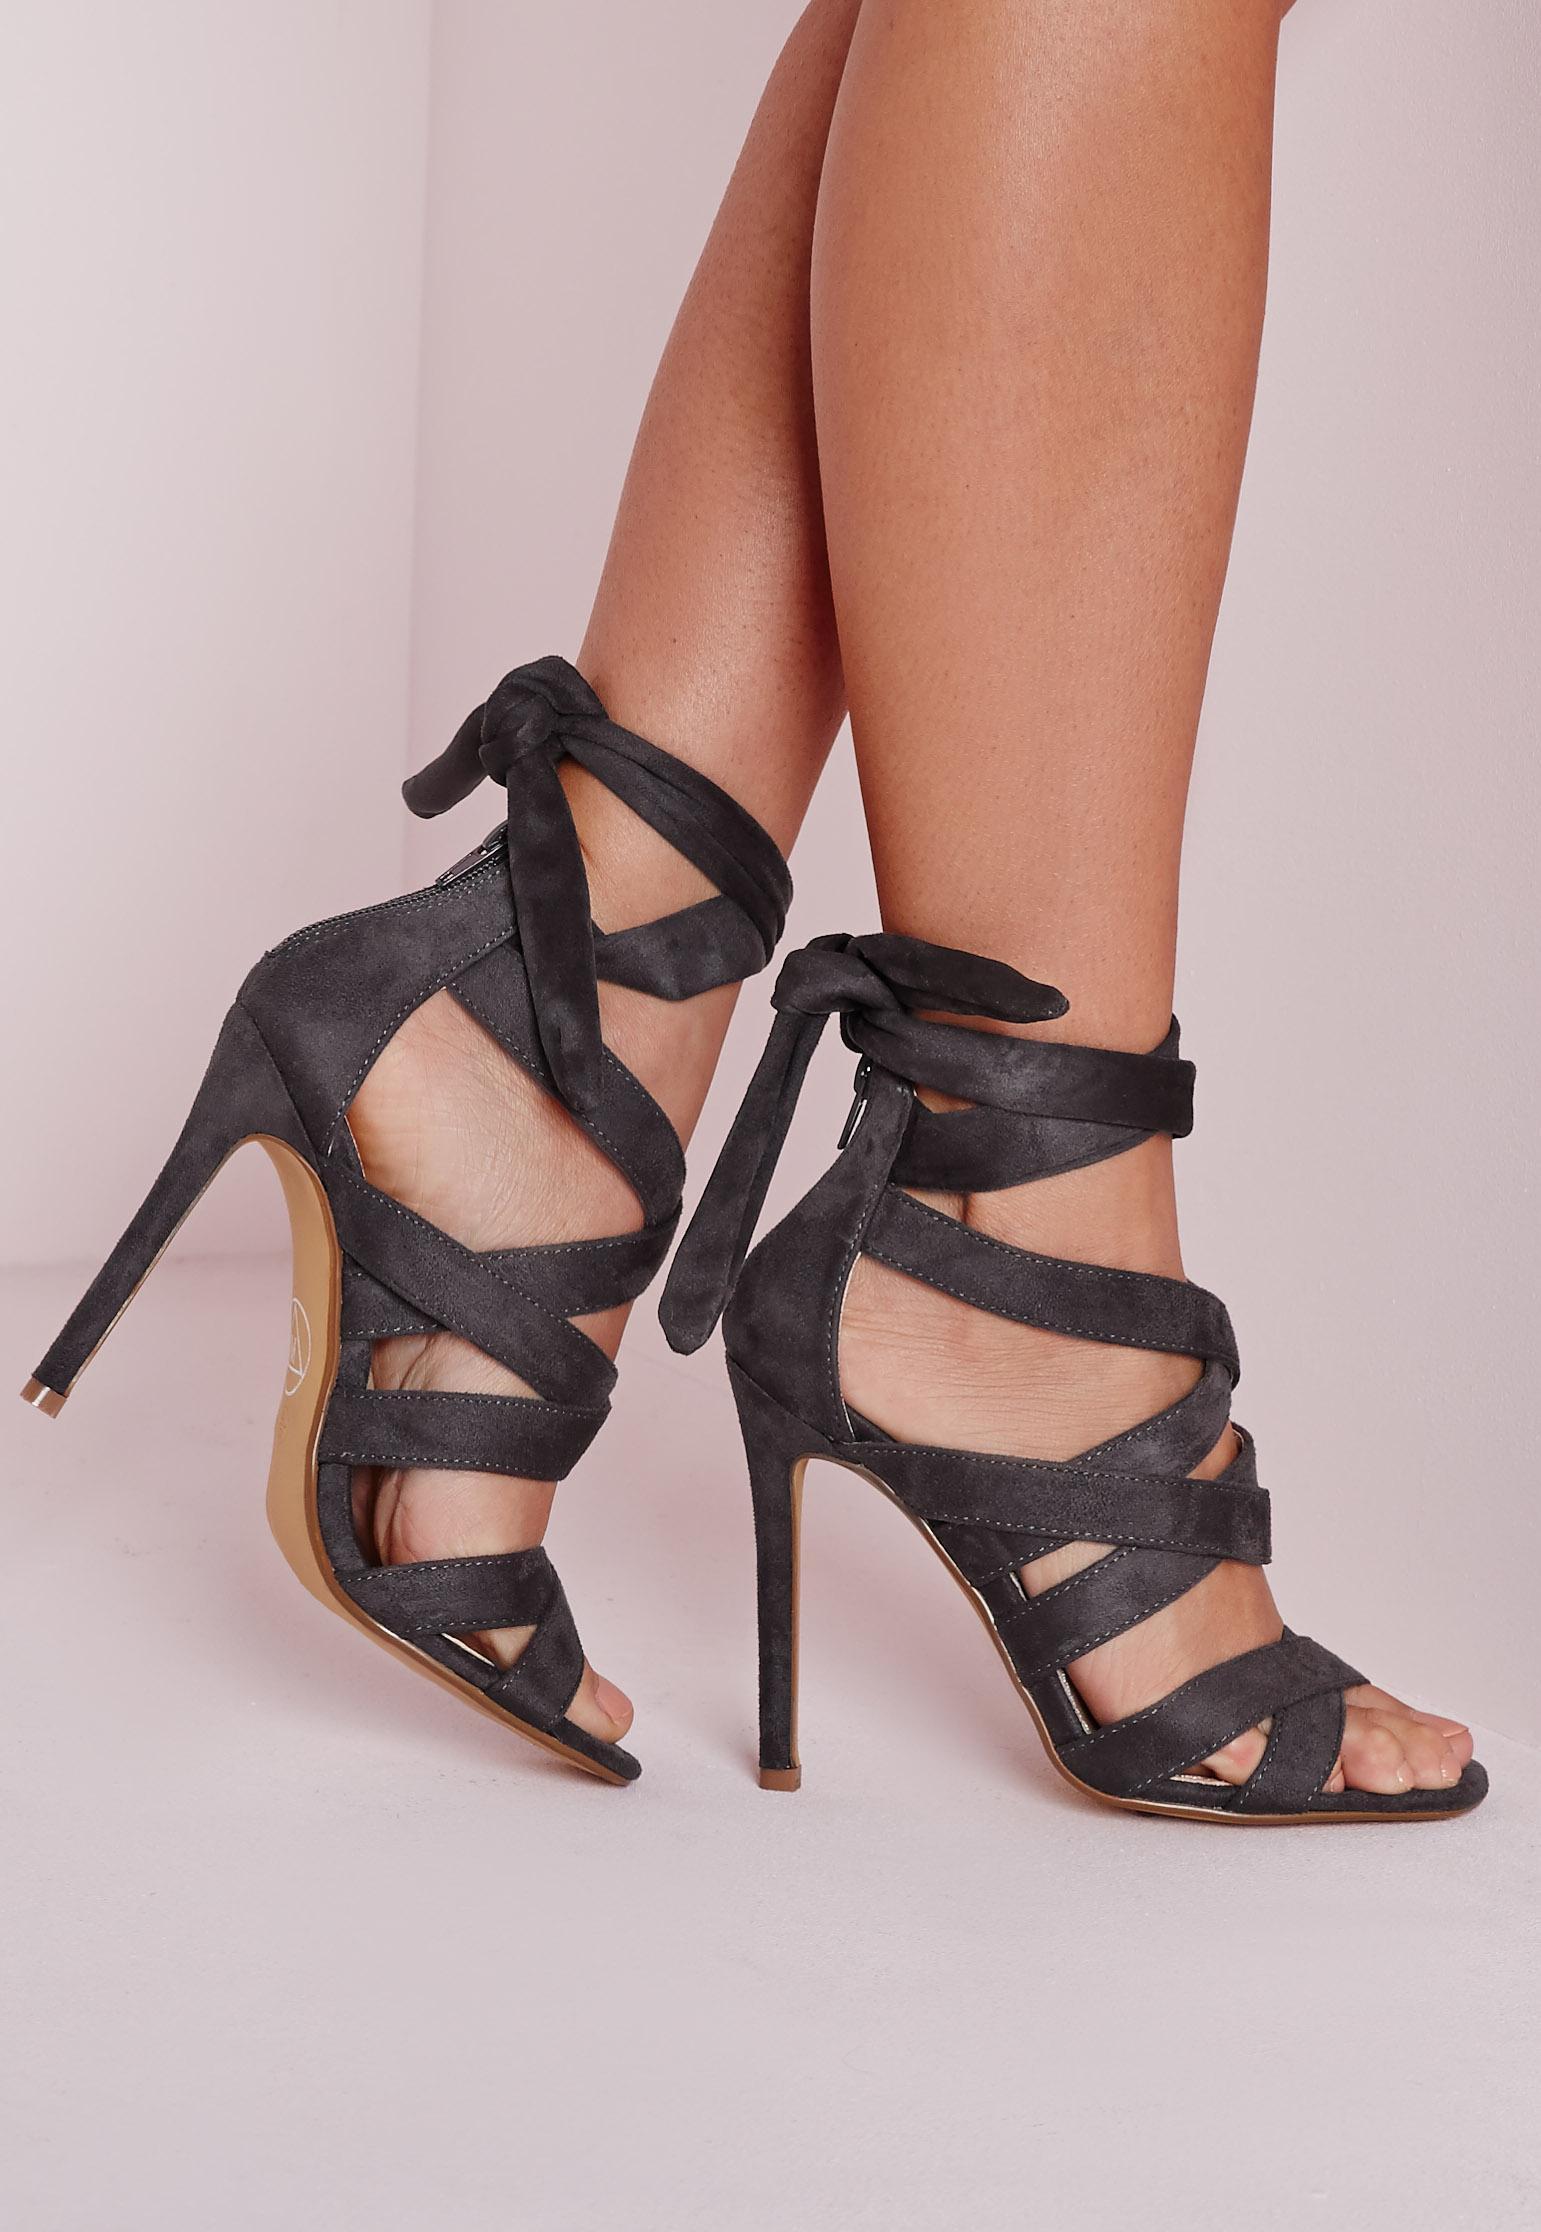 Lace Up Gladiator Heels Grey - Heels - Footwear - Missguided